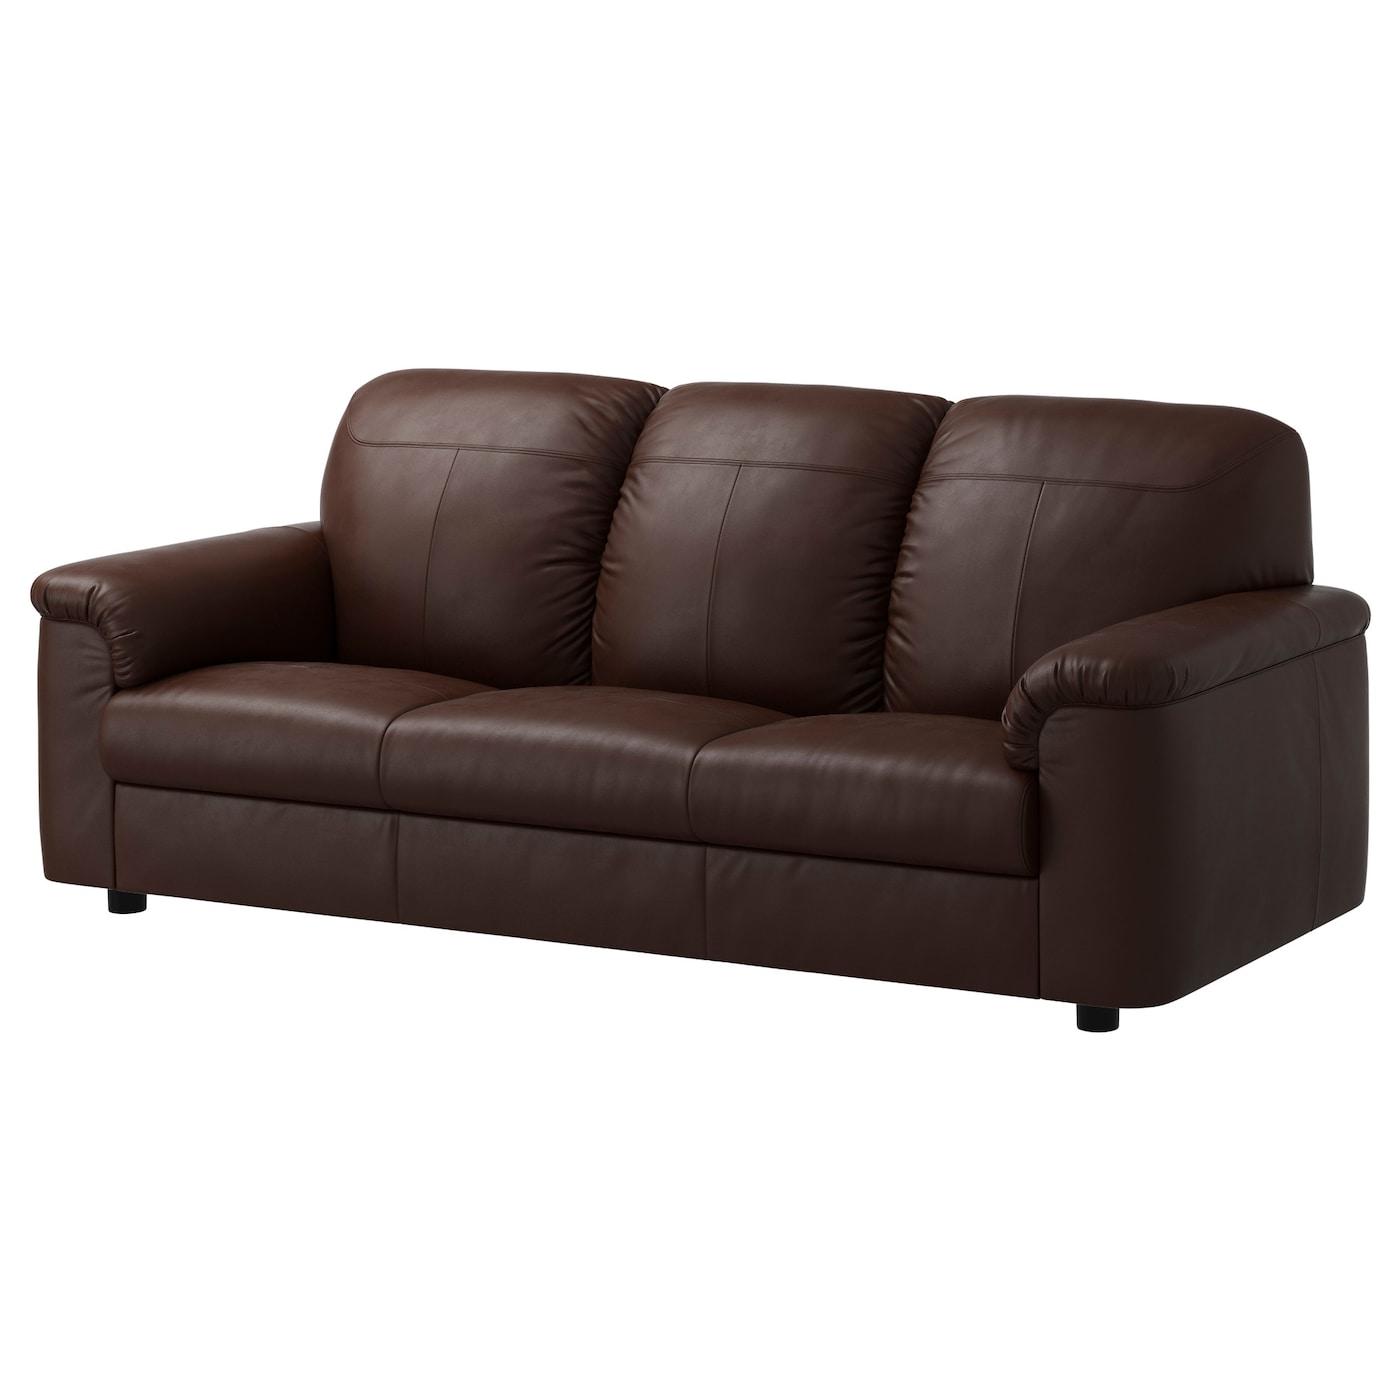 timsfors canap 3 places mjuk kimstad brun fonc ikea. Black Bedroom Furniture Sets. Home Design Ideas